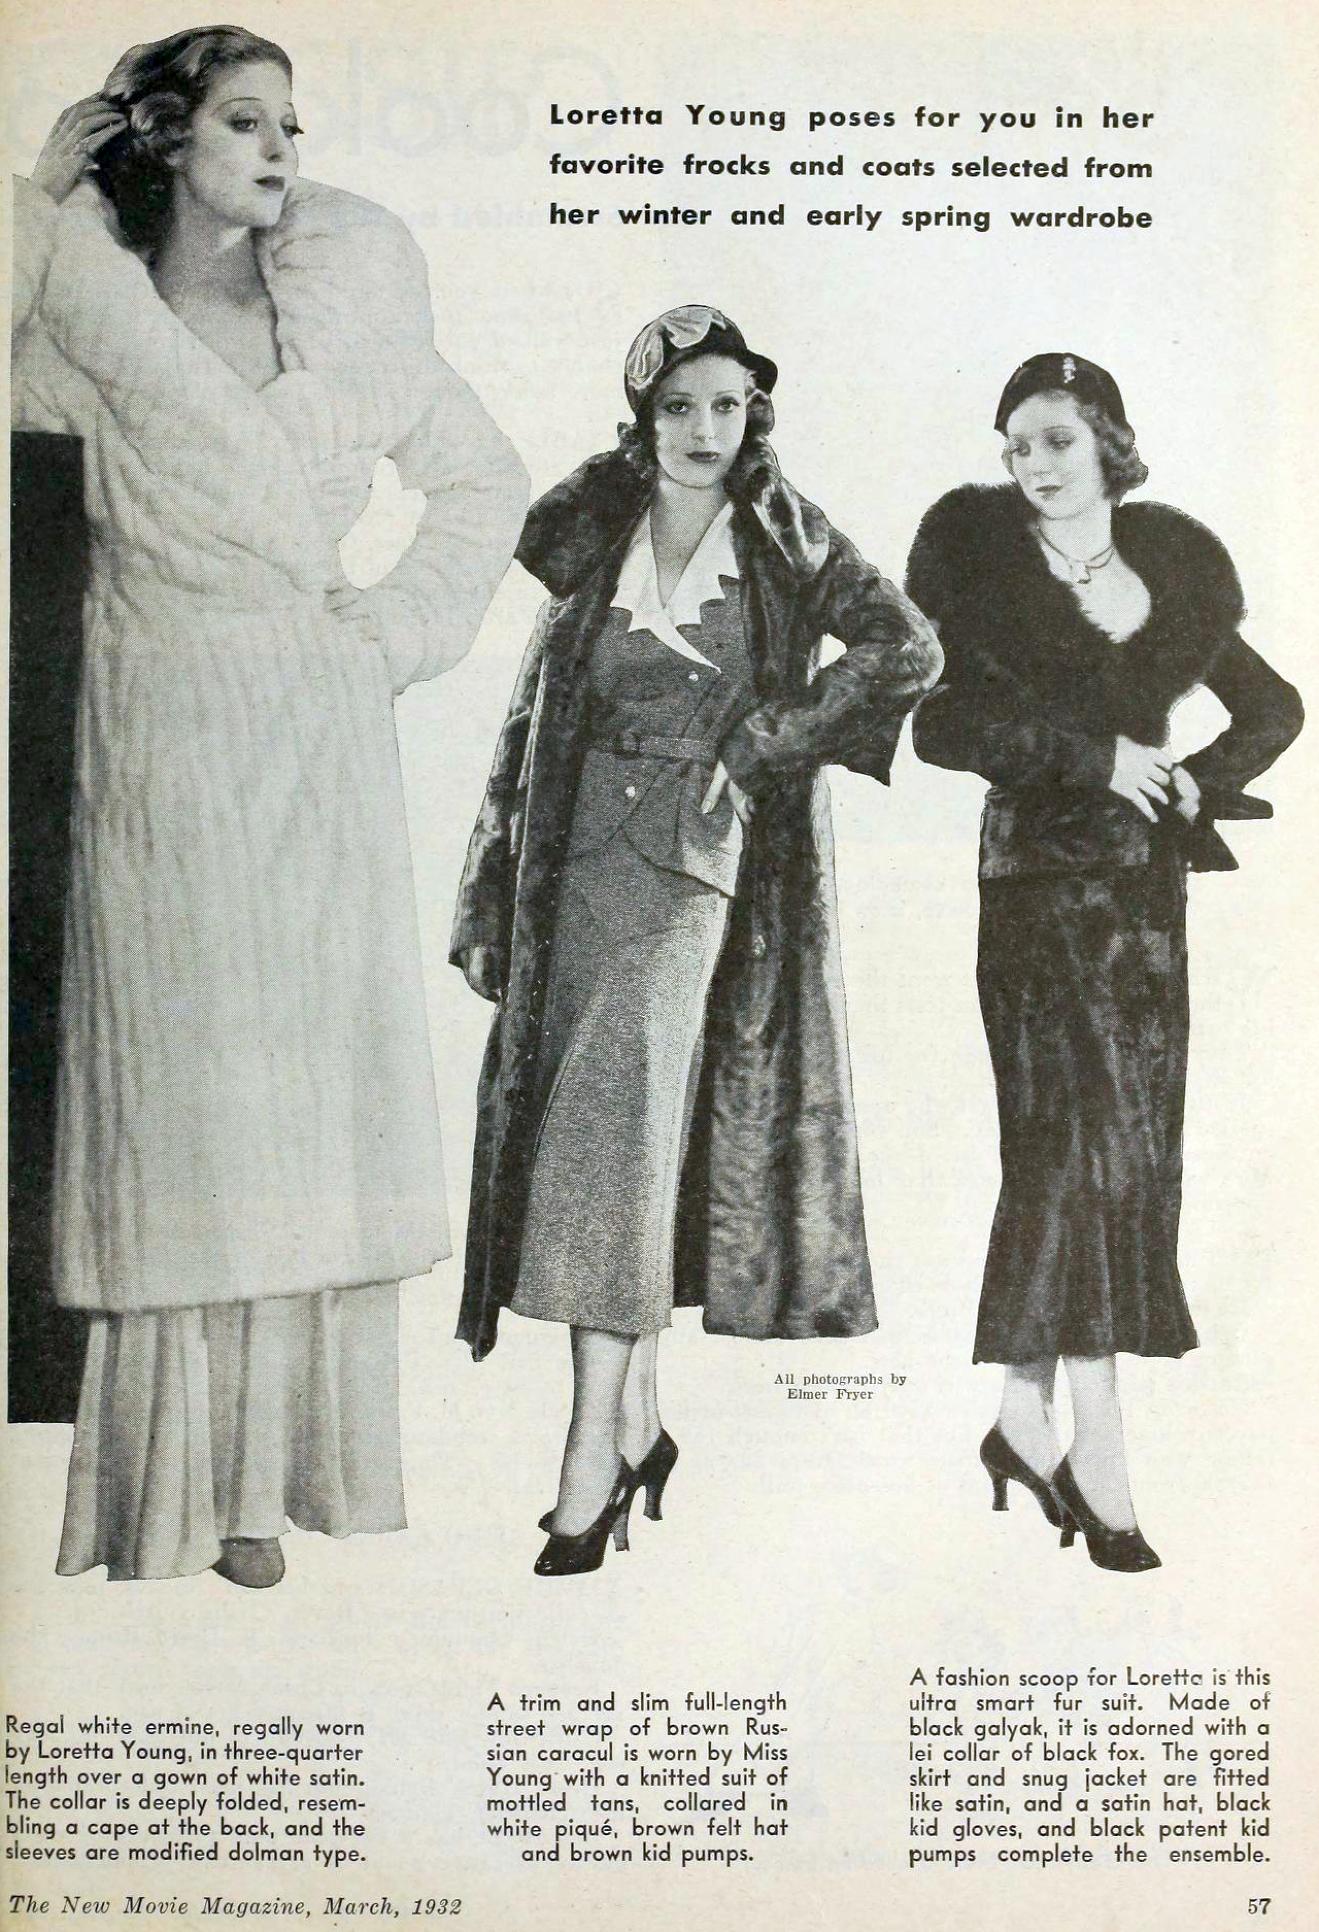 loretta young 01a the new movie magazine march 1932